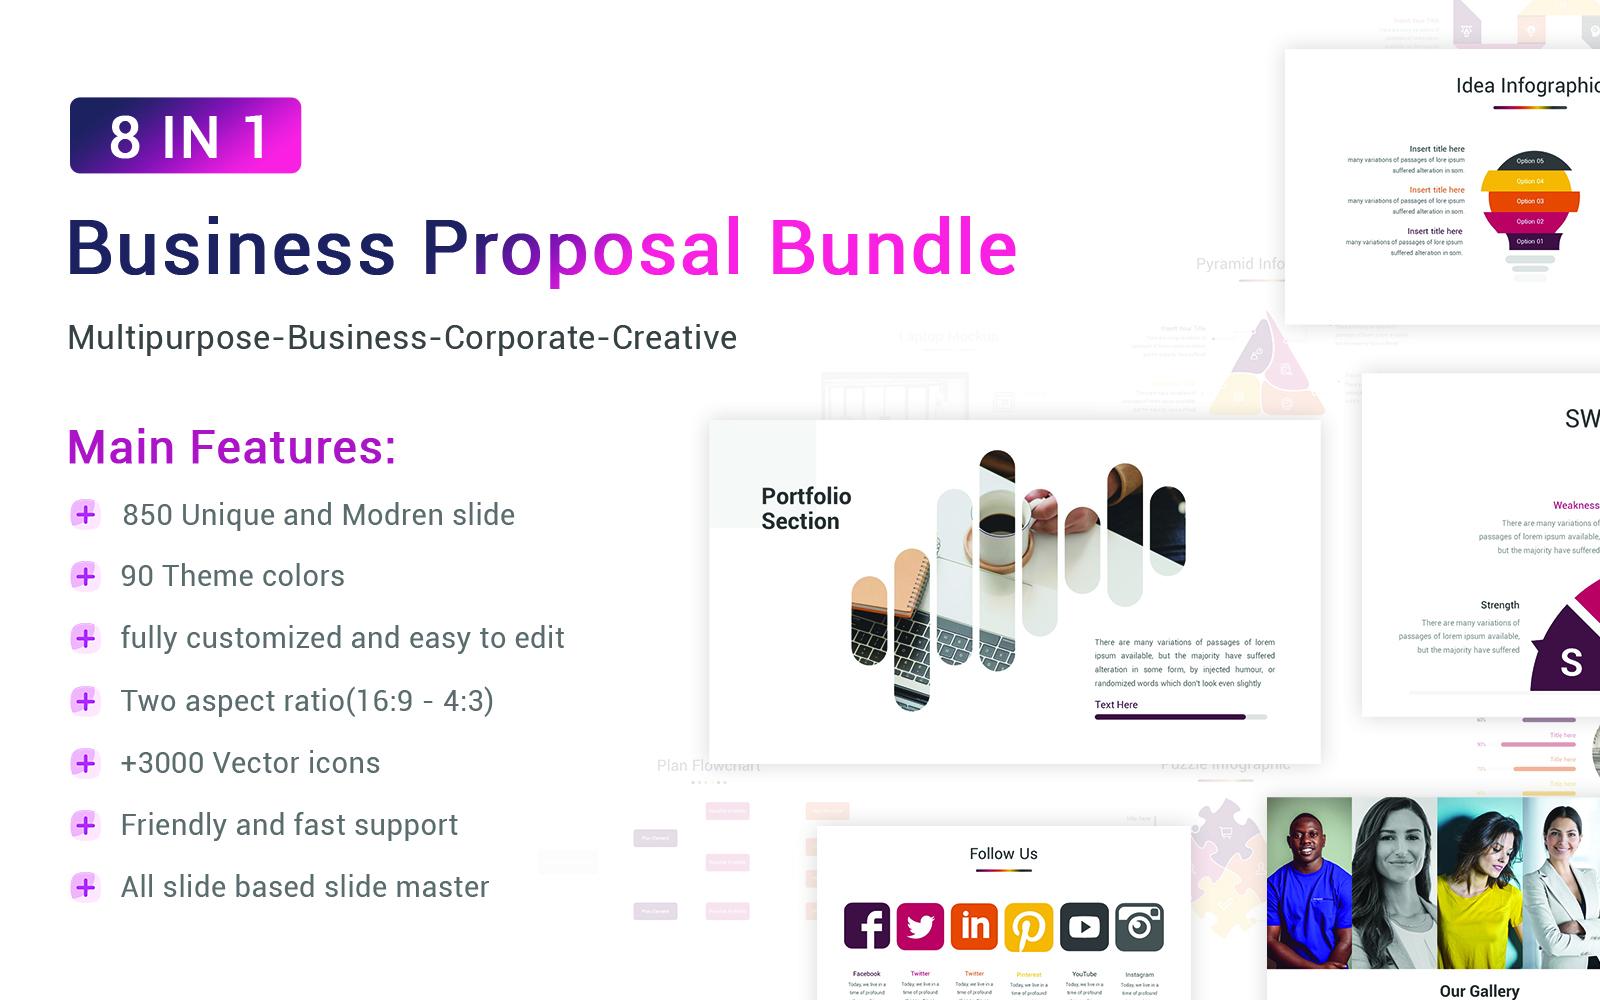 Business Proposal Bundle PowerPoint Template